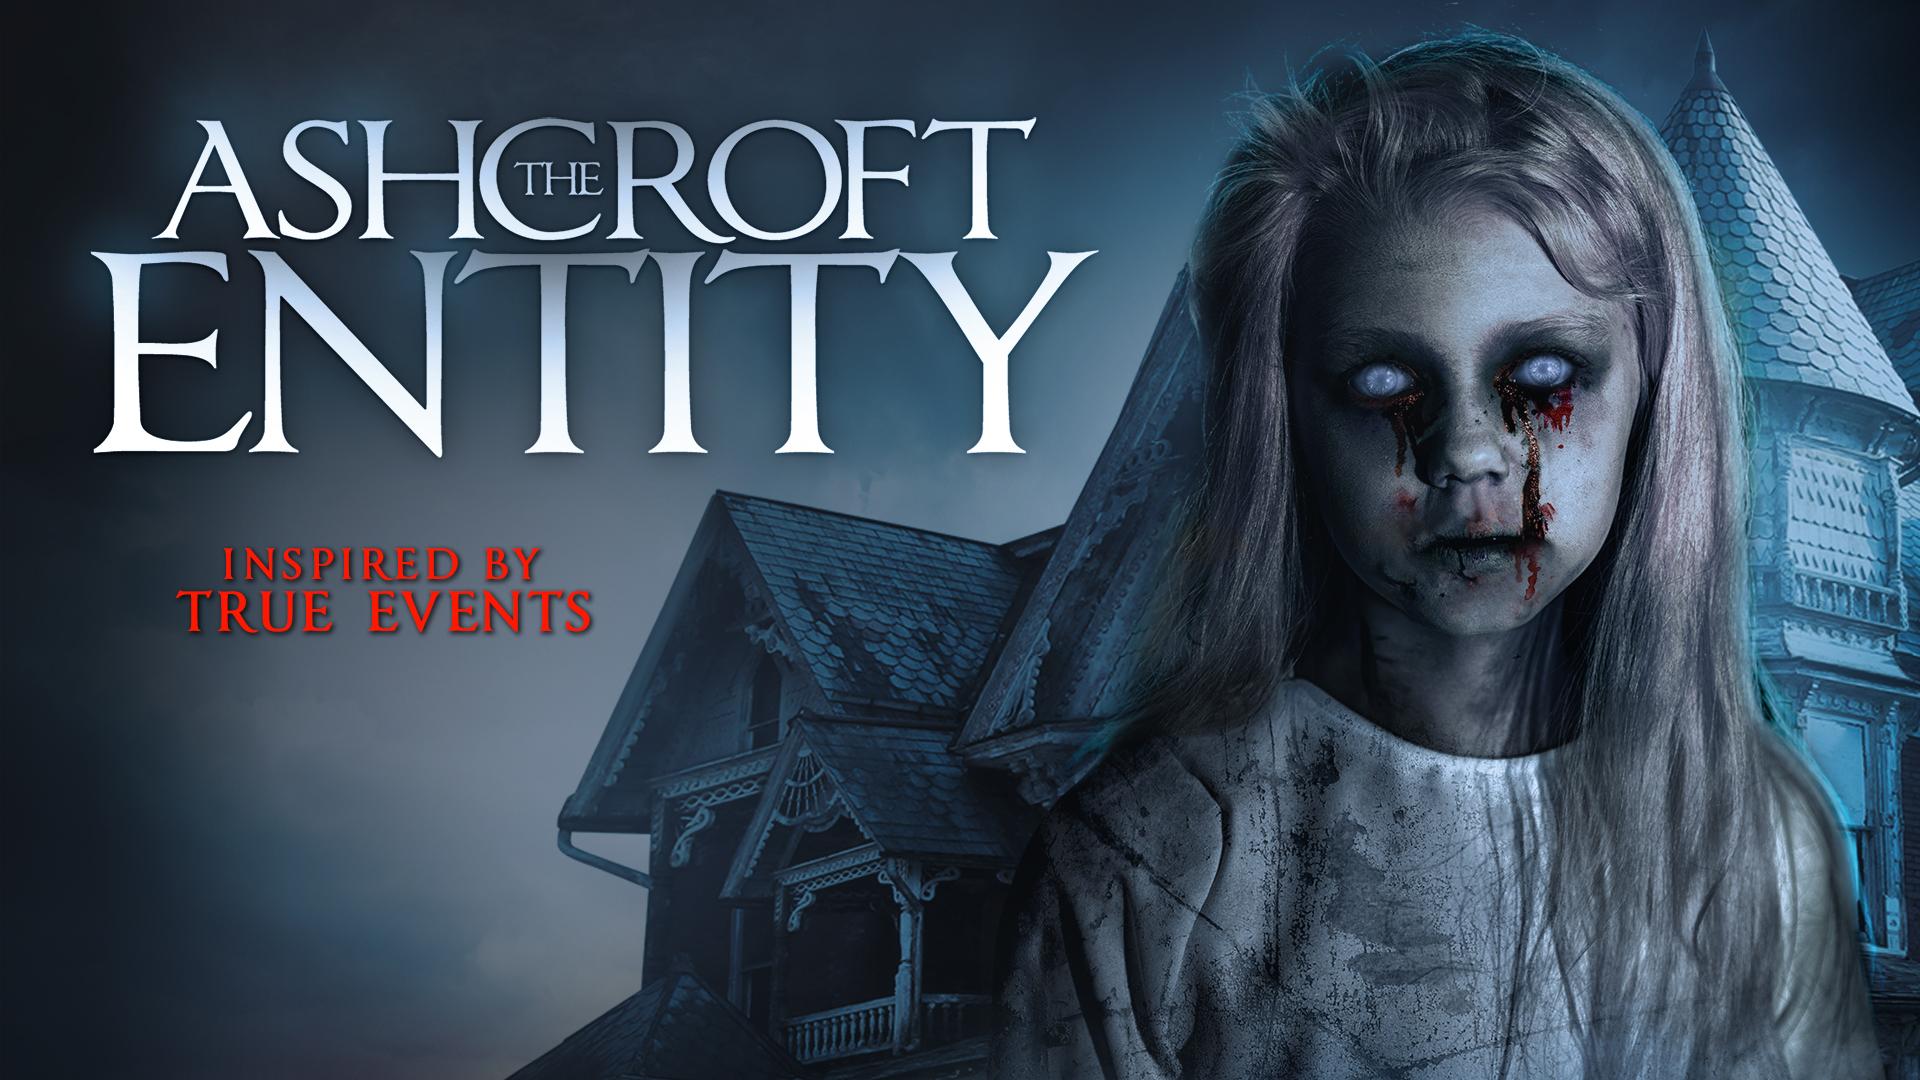 The Ashcroft Entity